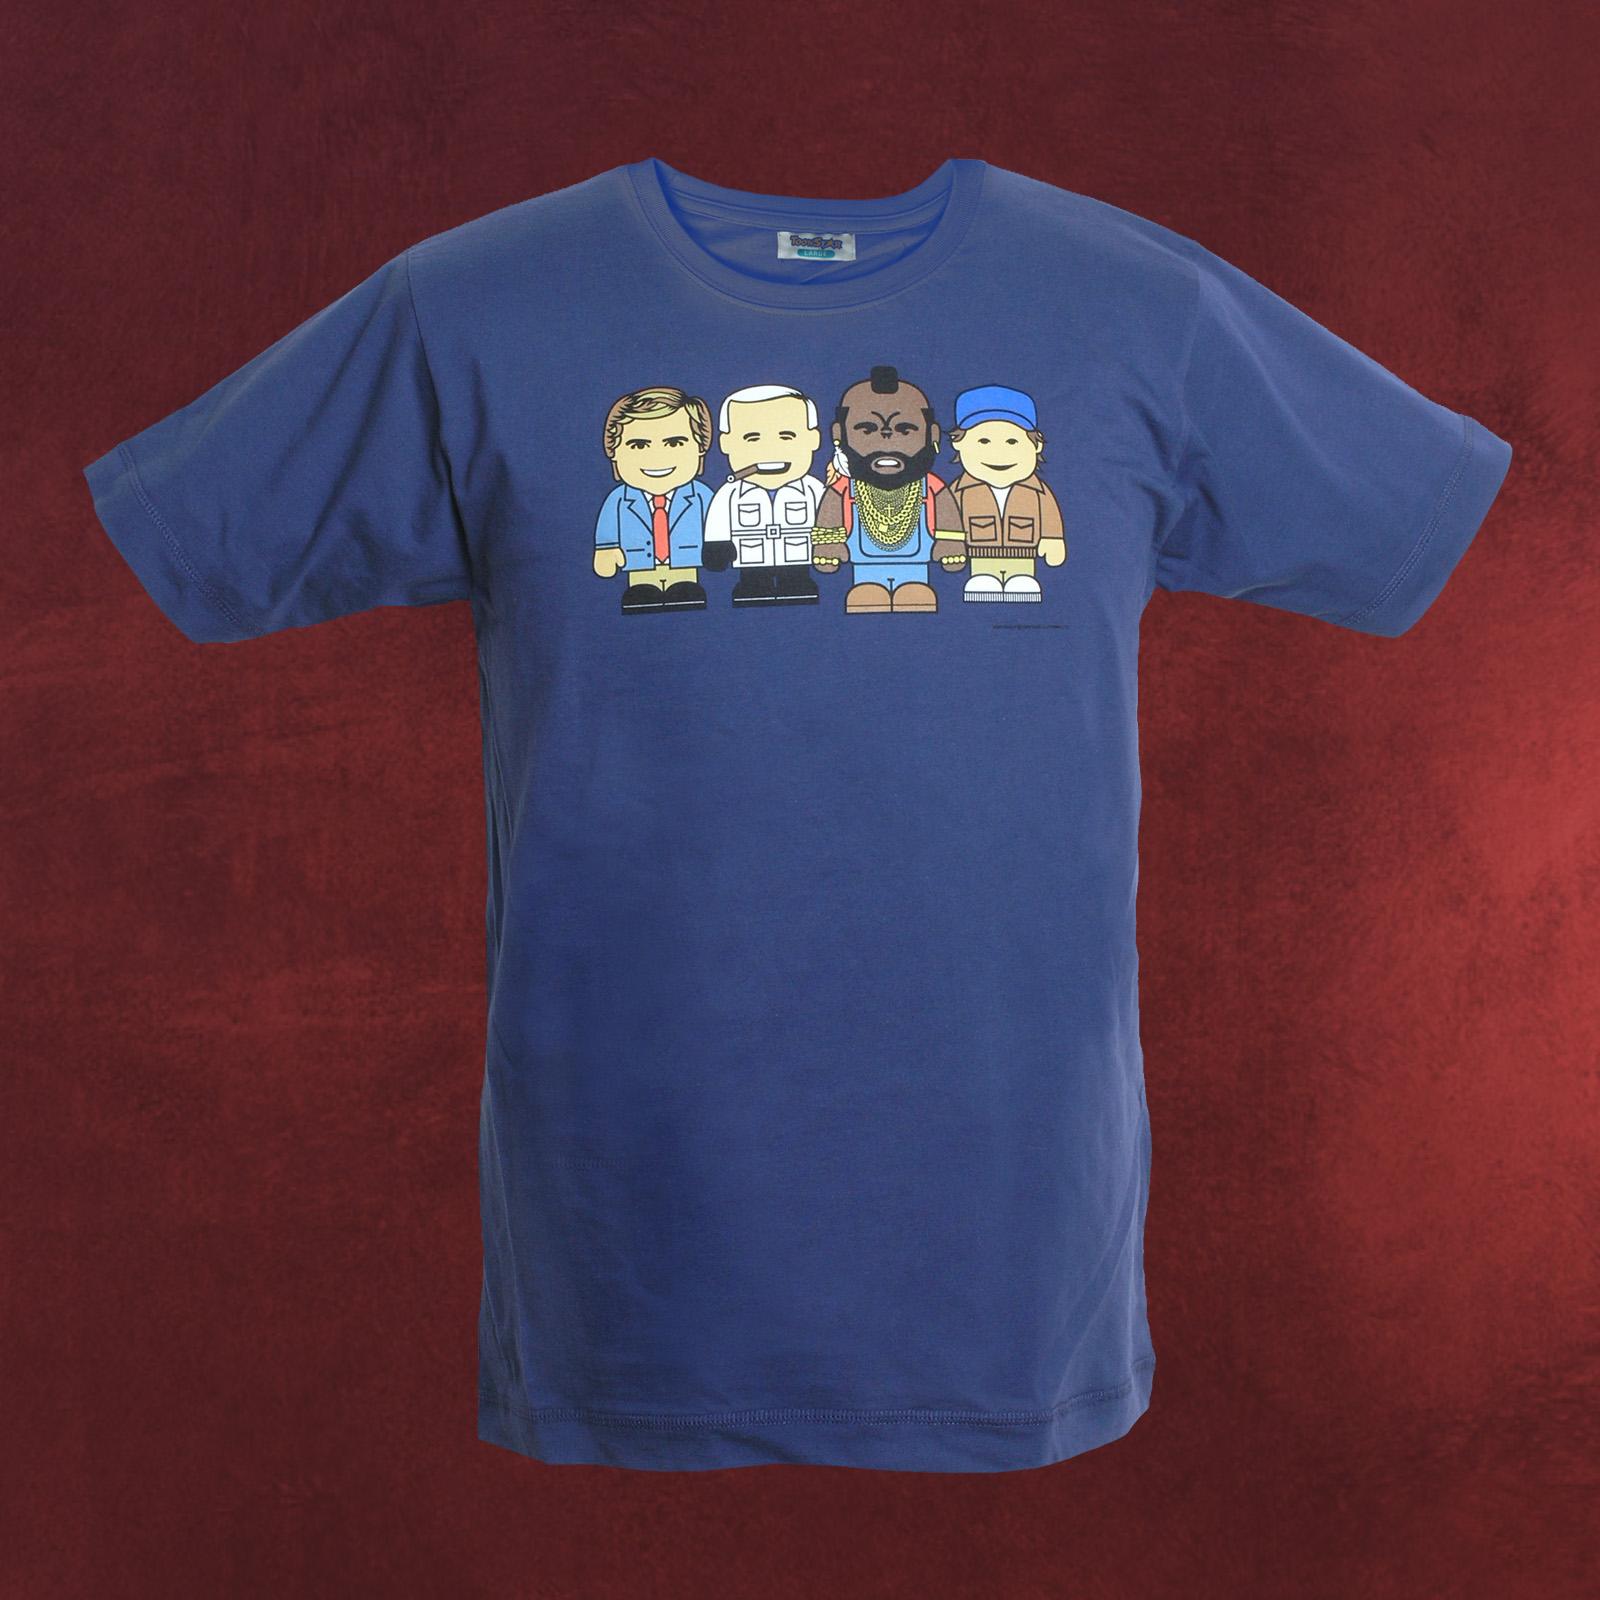 A team kult t shirt mit charakter comic print von hannibal for Team t shirt printing